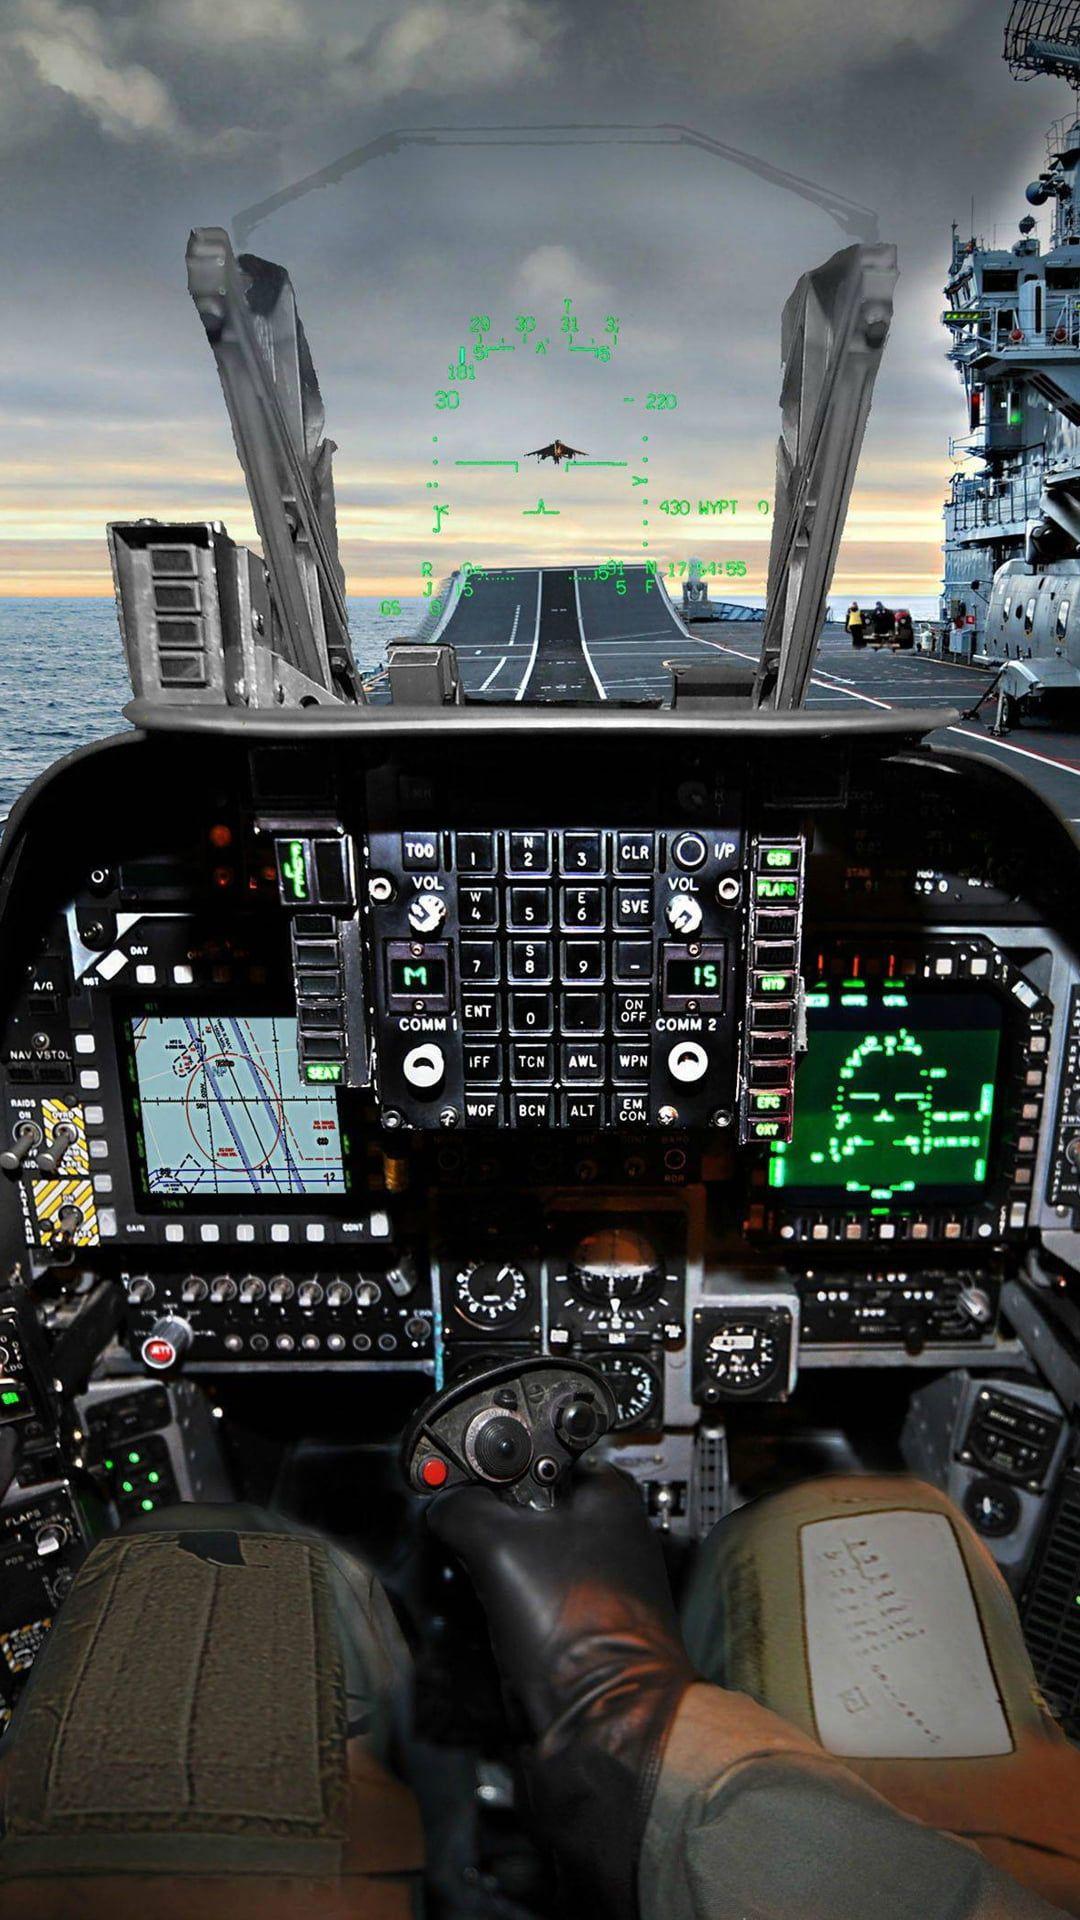 Airplane Cockpit Jet Fighter Pilot Airplane Wallpaper Airplane Fighter